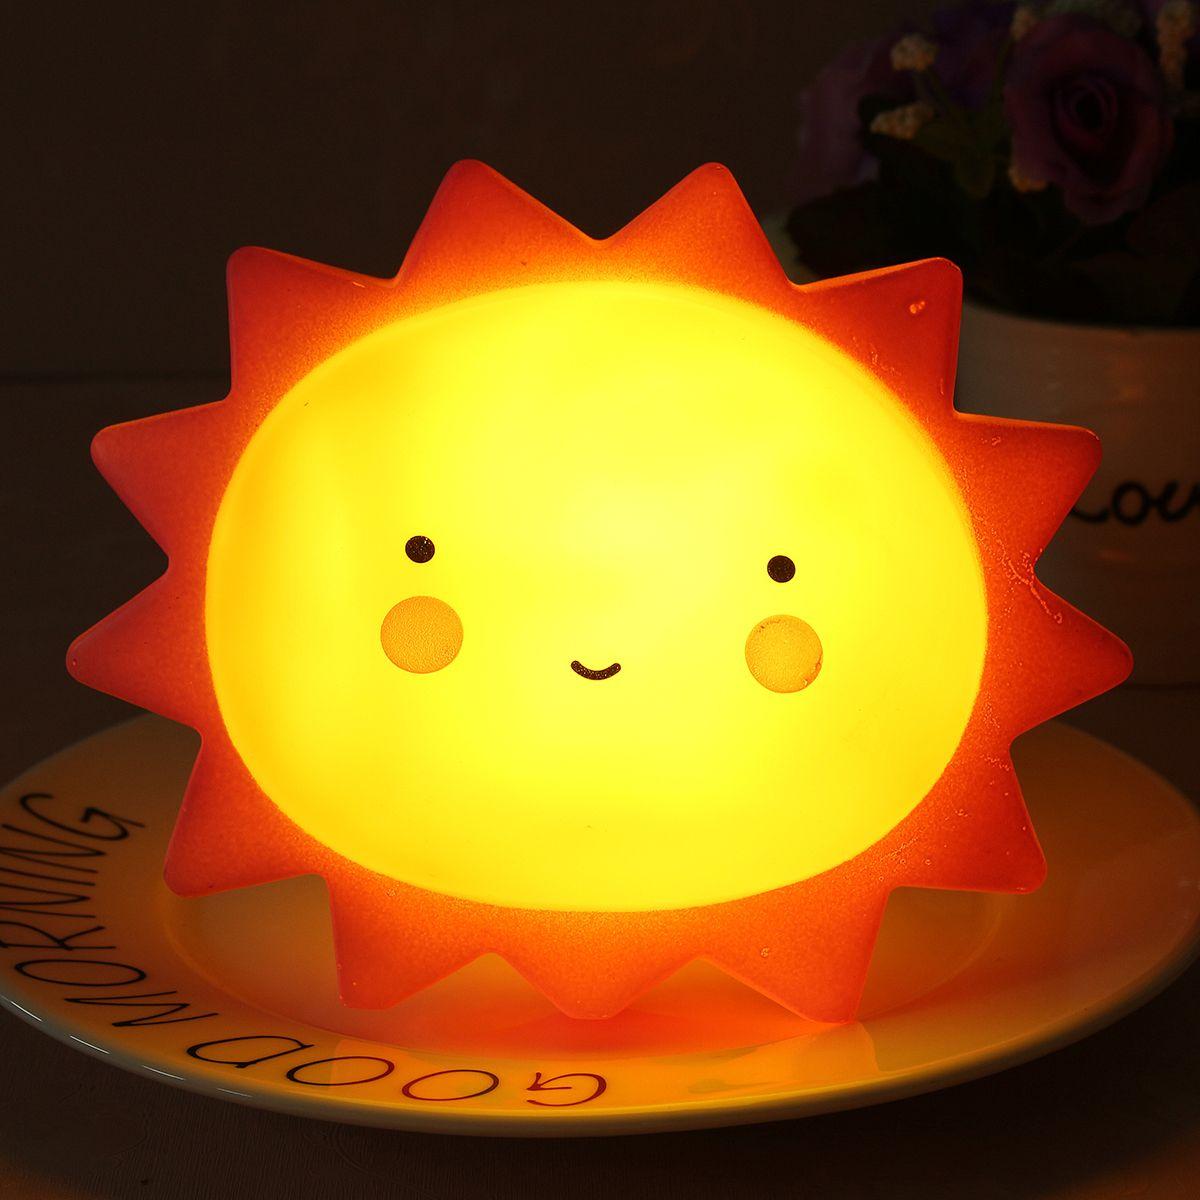 Us 7 99 Sun Shape Children Kid Baby Cute Led Night Light Lamp For Bathroom Home Decor Indoor Lighting From Lights Lighting On Banggood Com Night Light Lamp Led